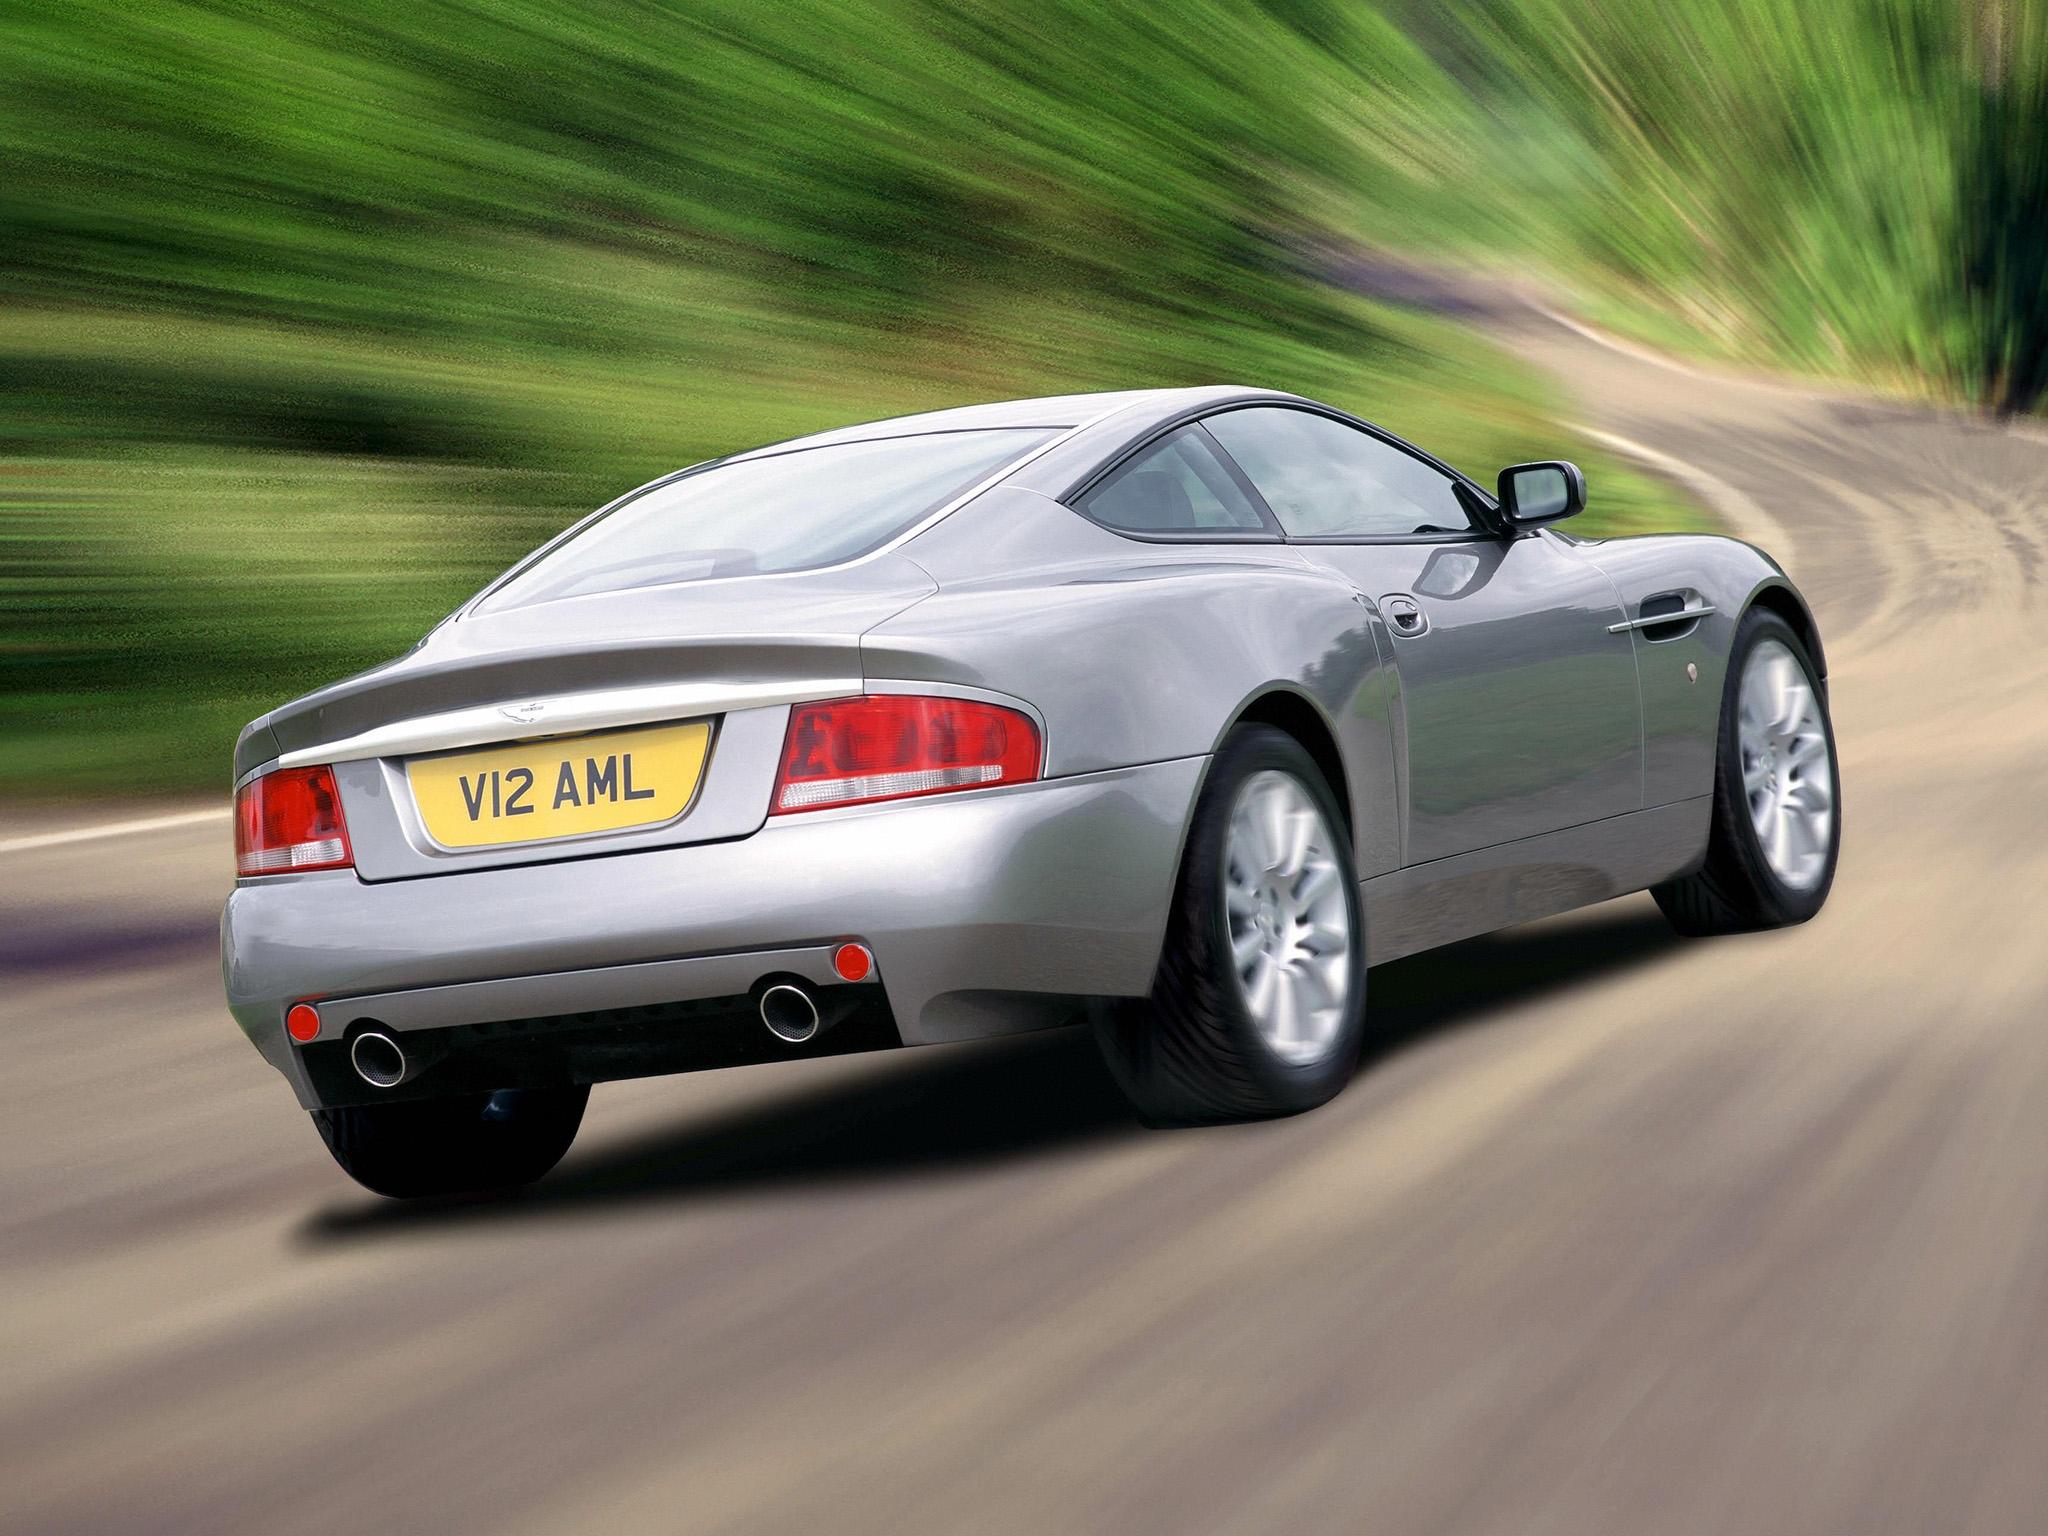 Wallpaper : Rear View, Sports Car, Aston Martin, Aston Martin DBS, Silver,  Coupe, Performance Car, Aston Martin DB9, Aston Martin Vanquish, Aston  Martin ...